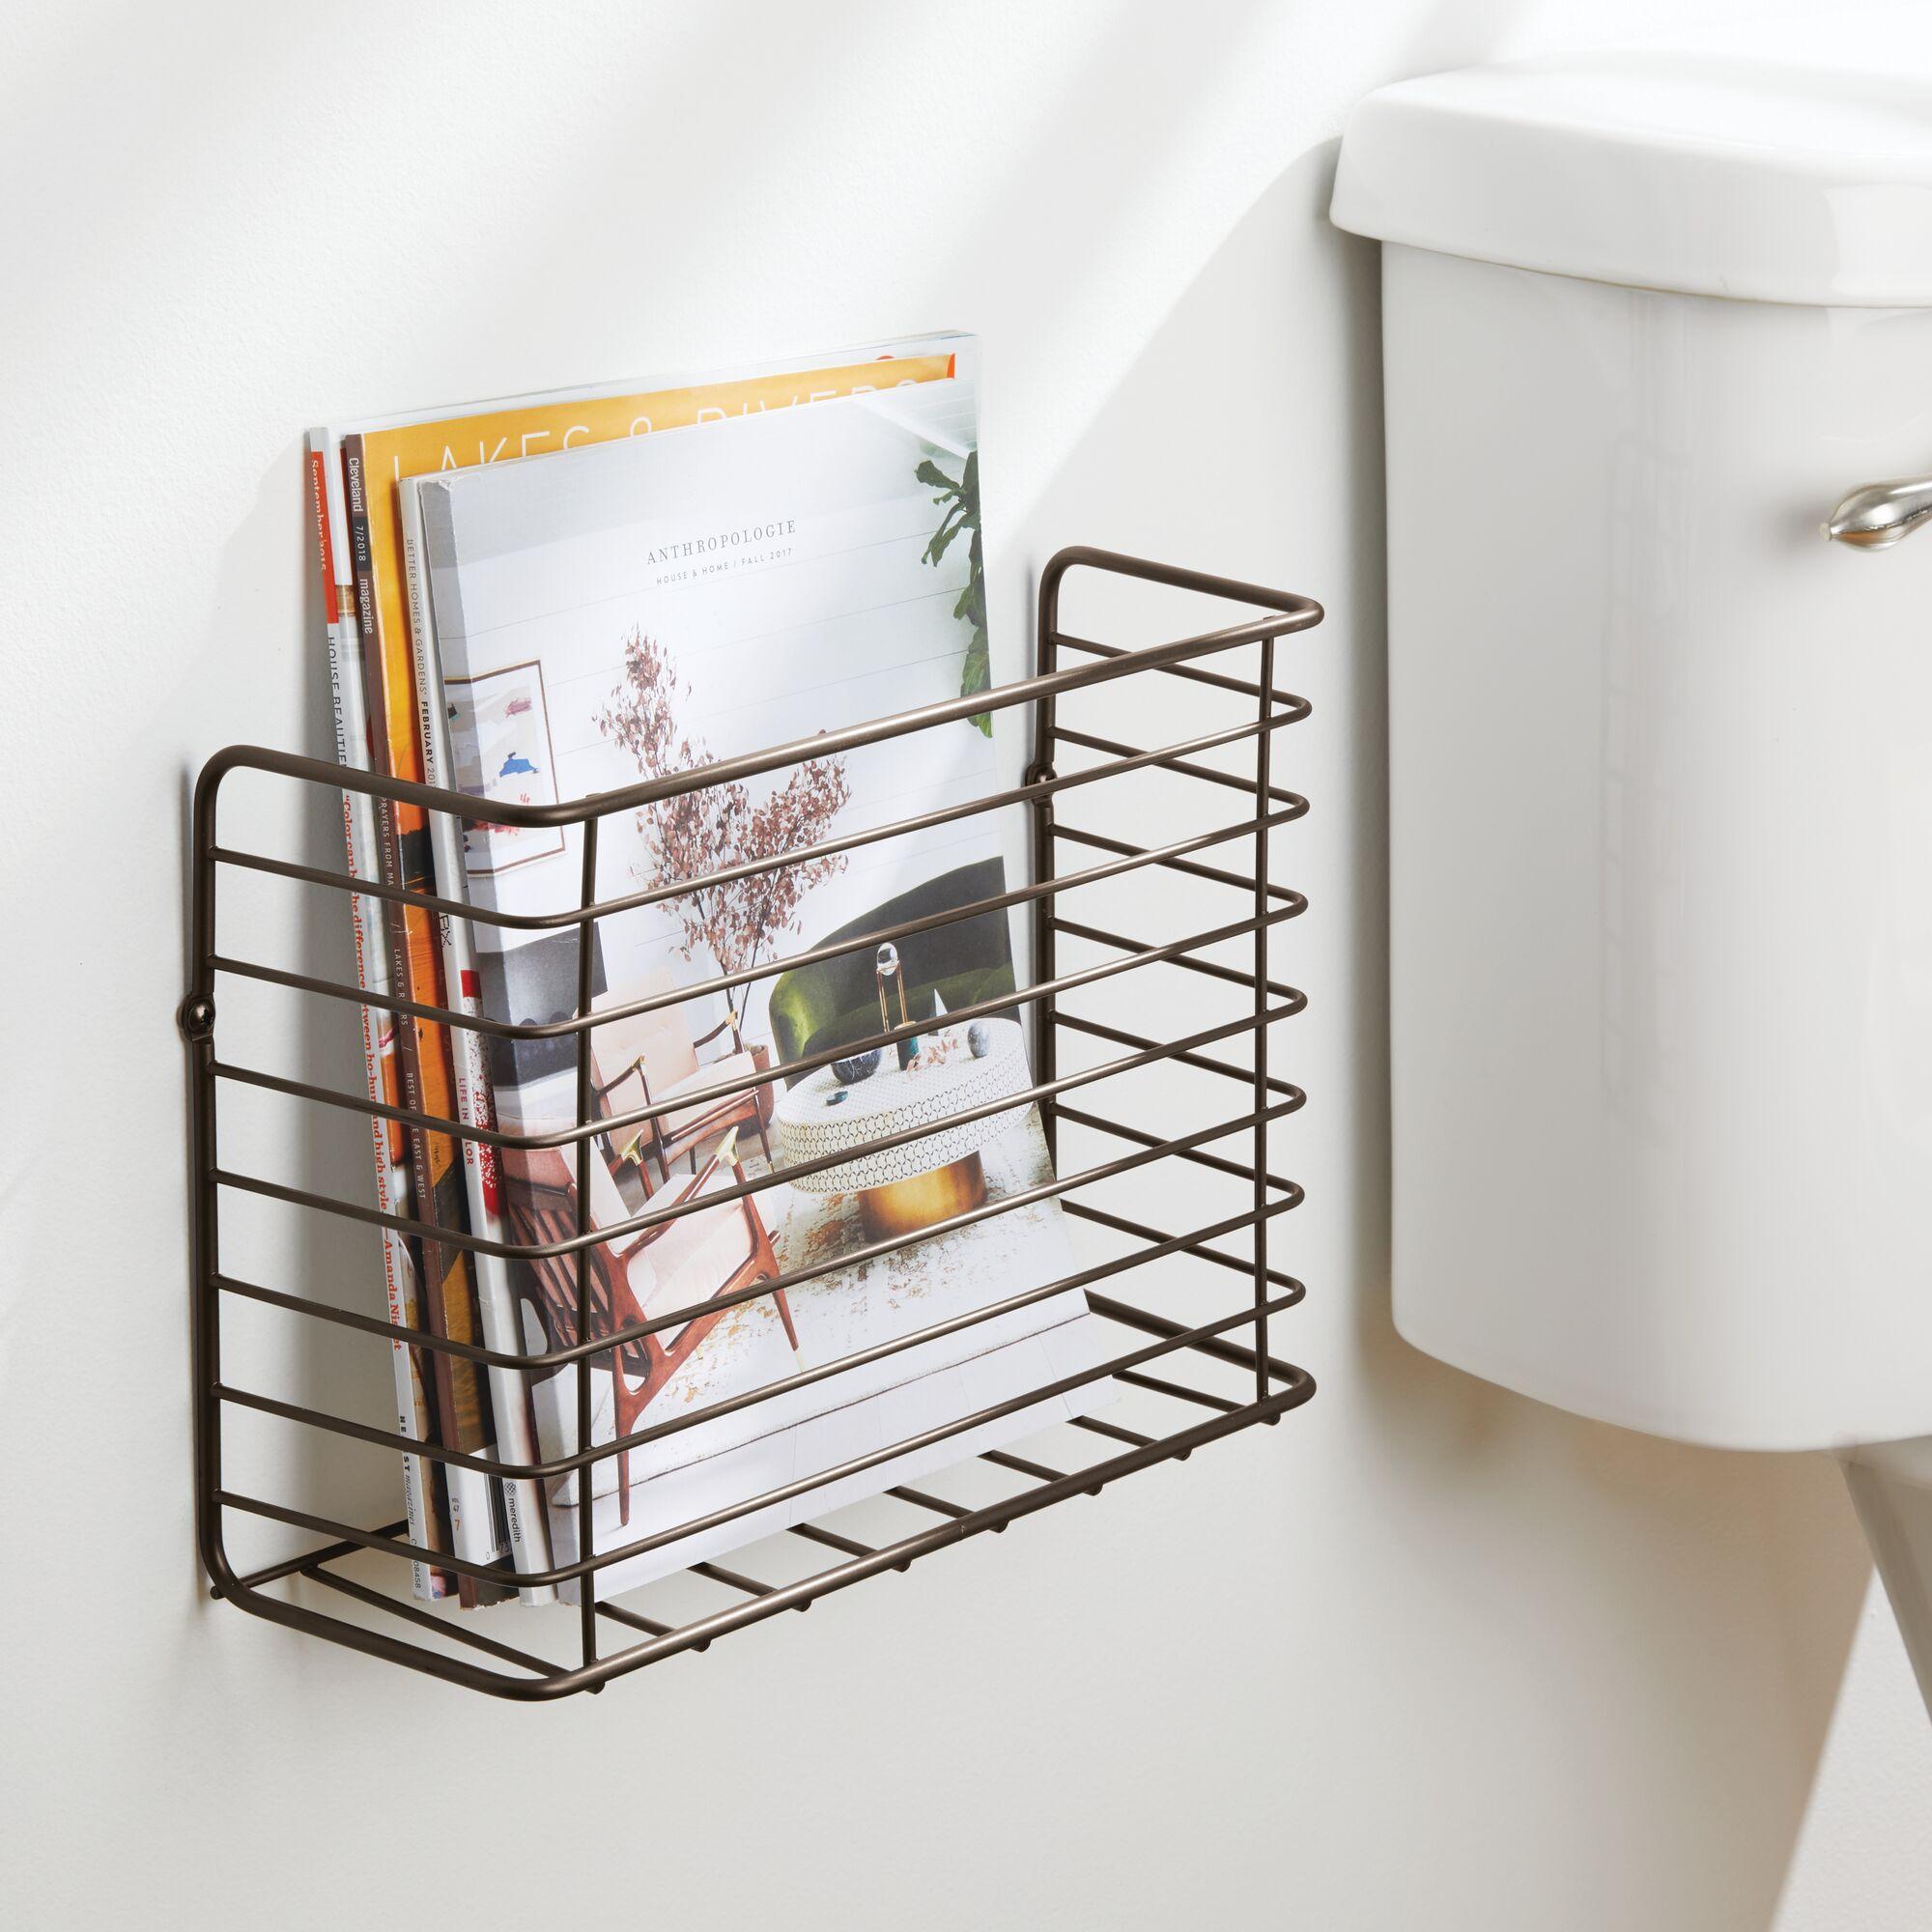 mDesign-Metal-Wall-Mount-Magazine-Holder-Storage-Organizer-Rack thumbnail 19